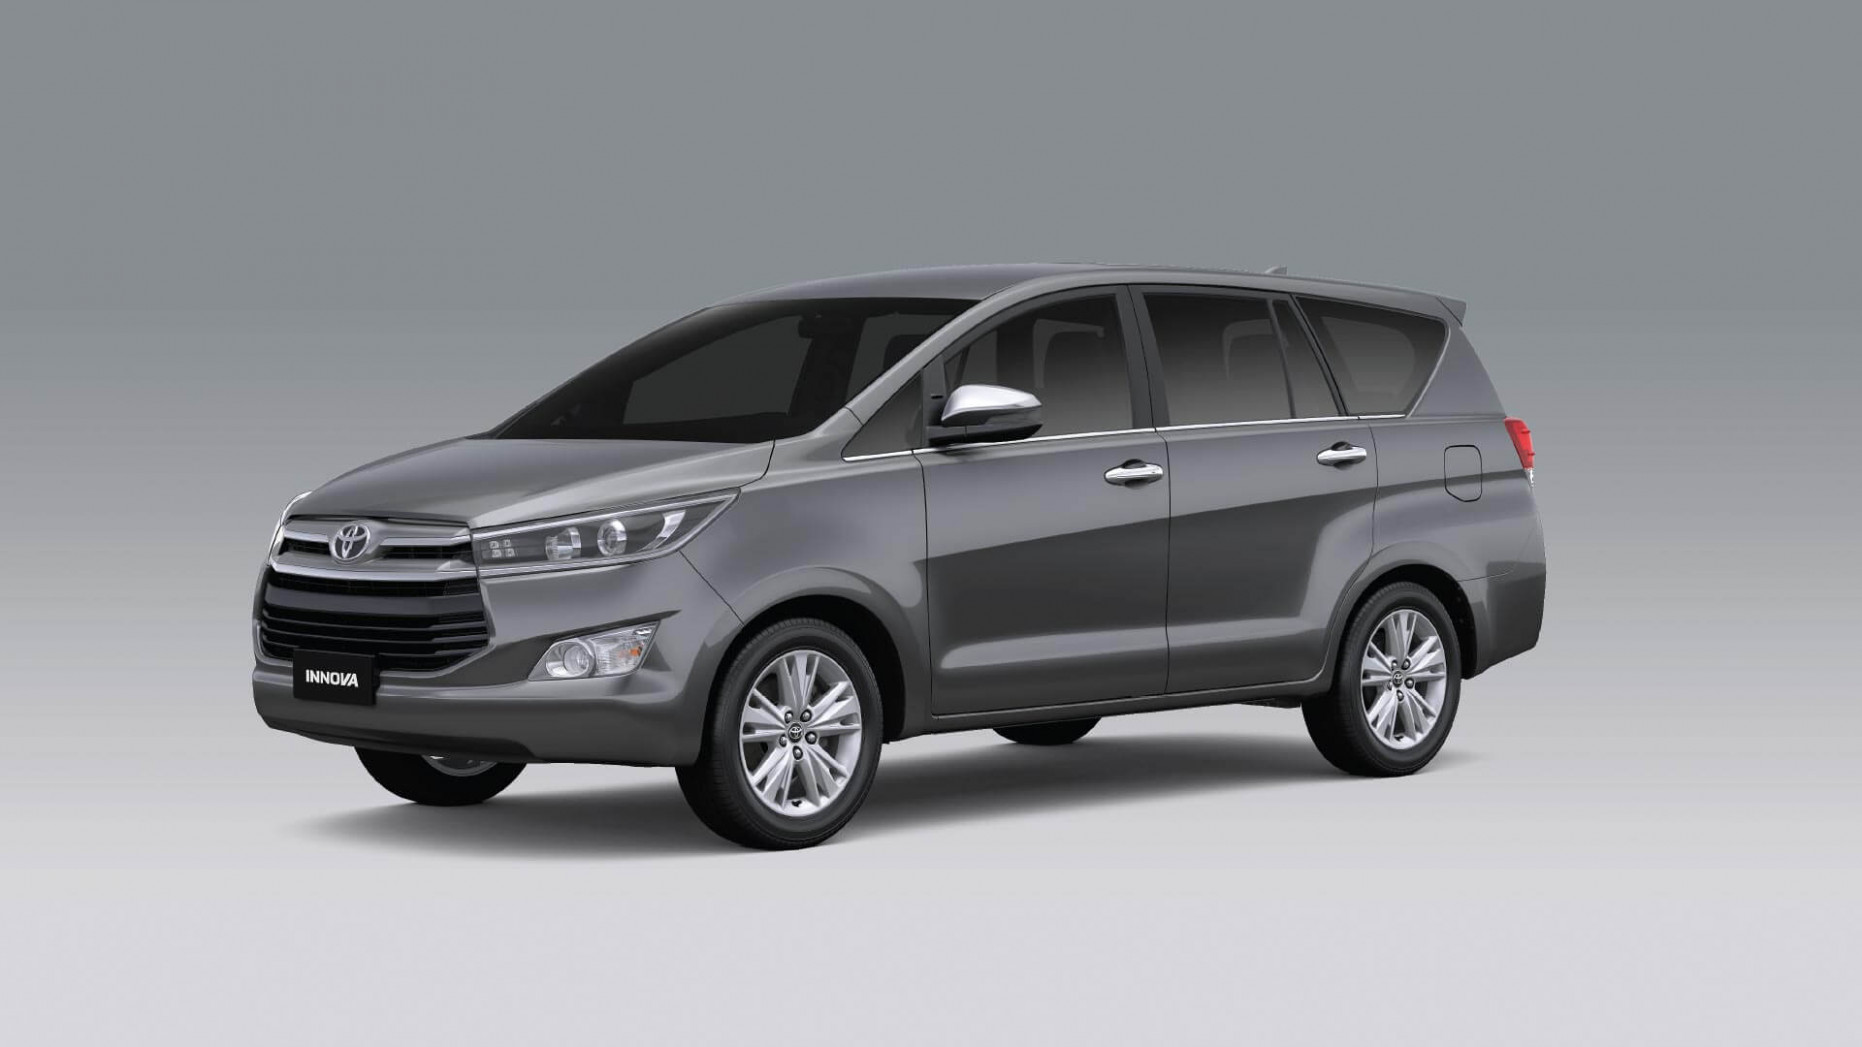 Model Toyota Innova 2022 Model